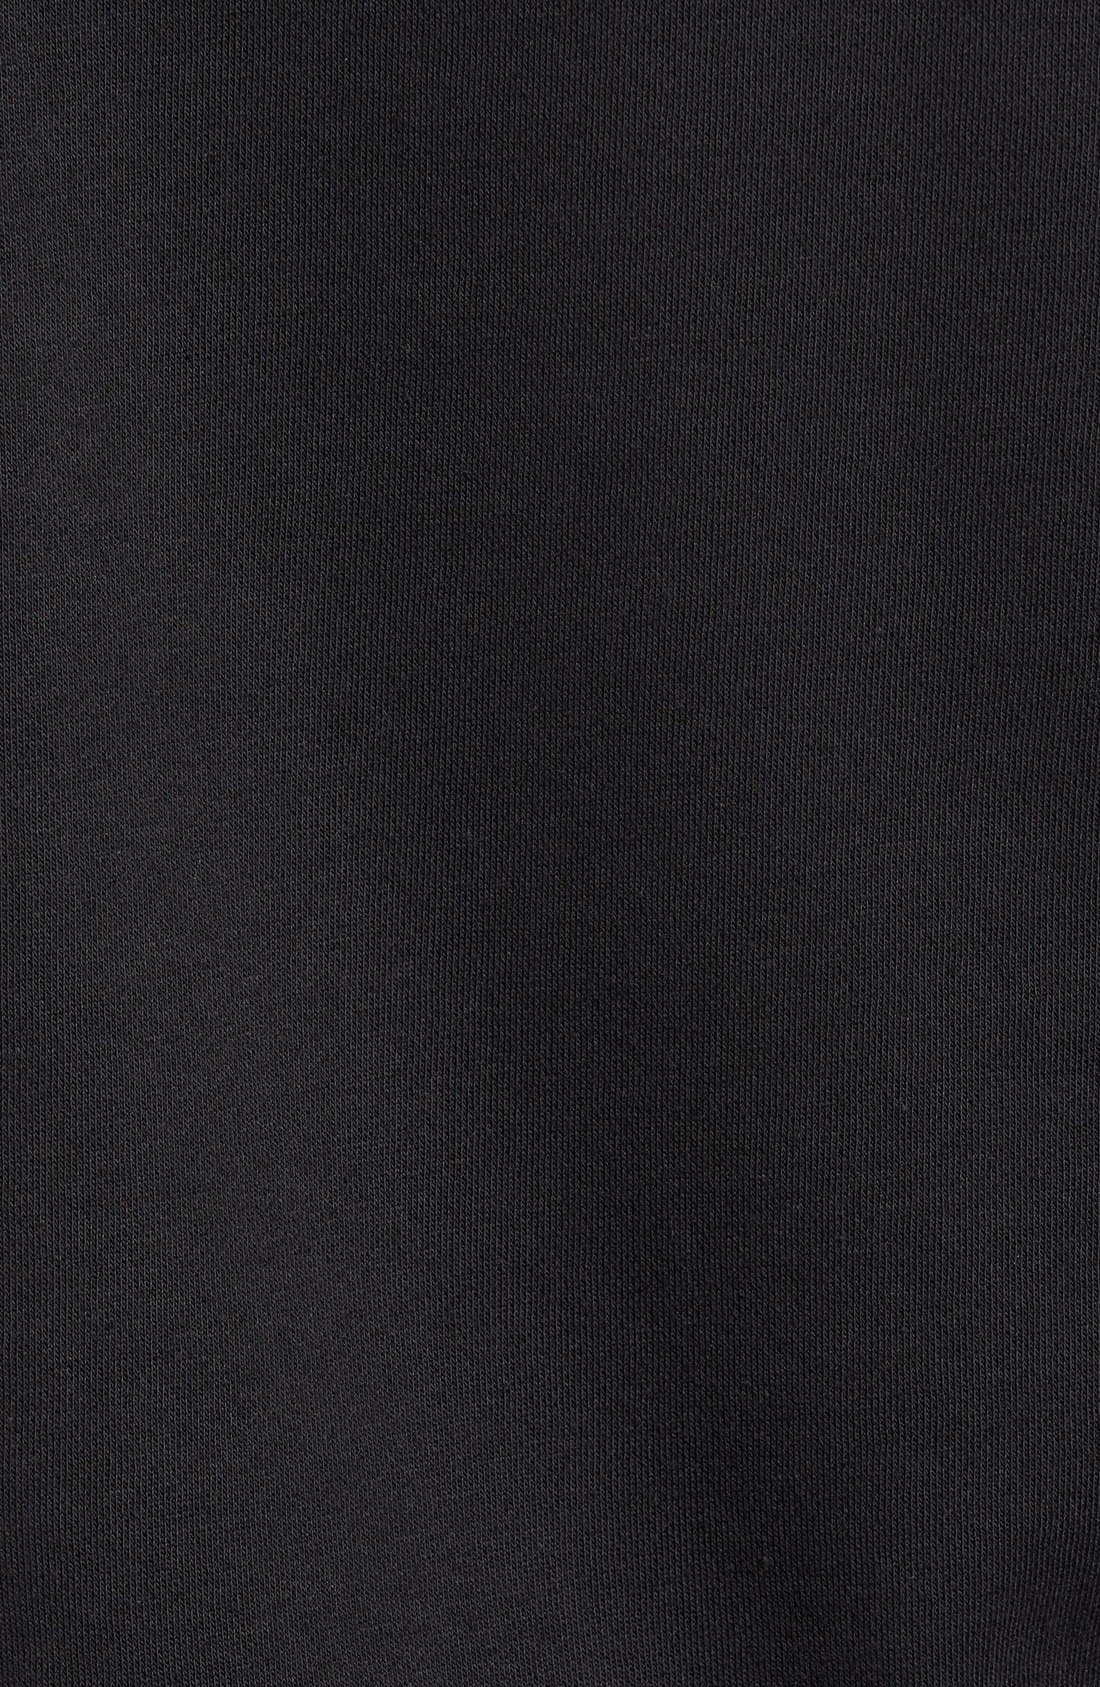 Slim Fit Trefoil Logo Crewneck Sweatshirt,                             Alternate thumbnail 5, color,                             Black